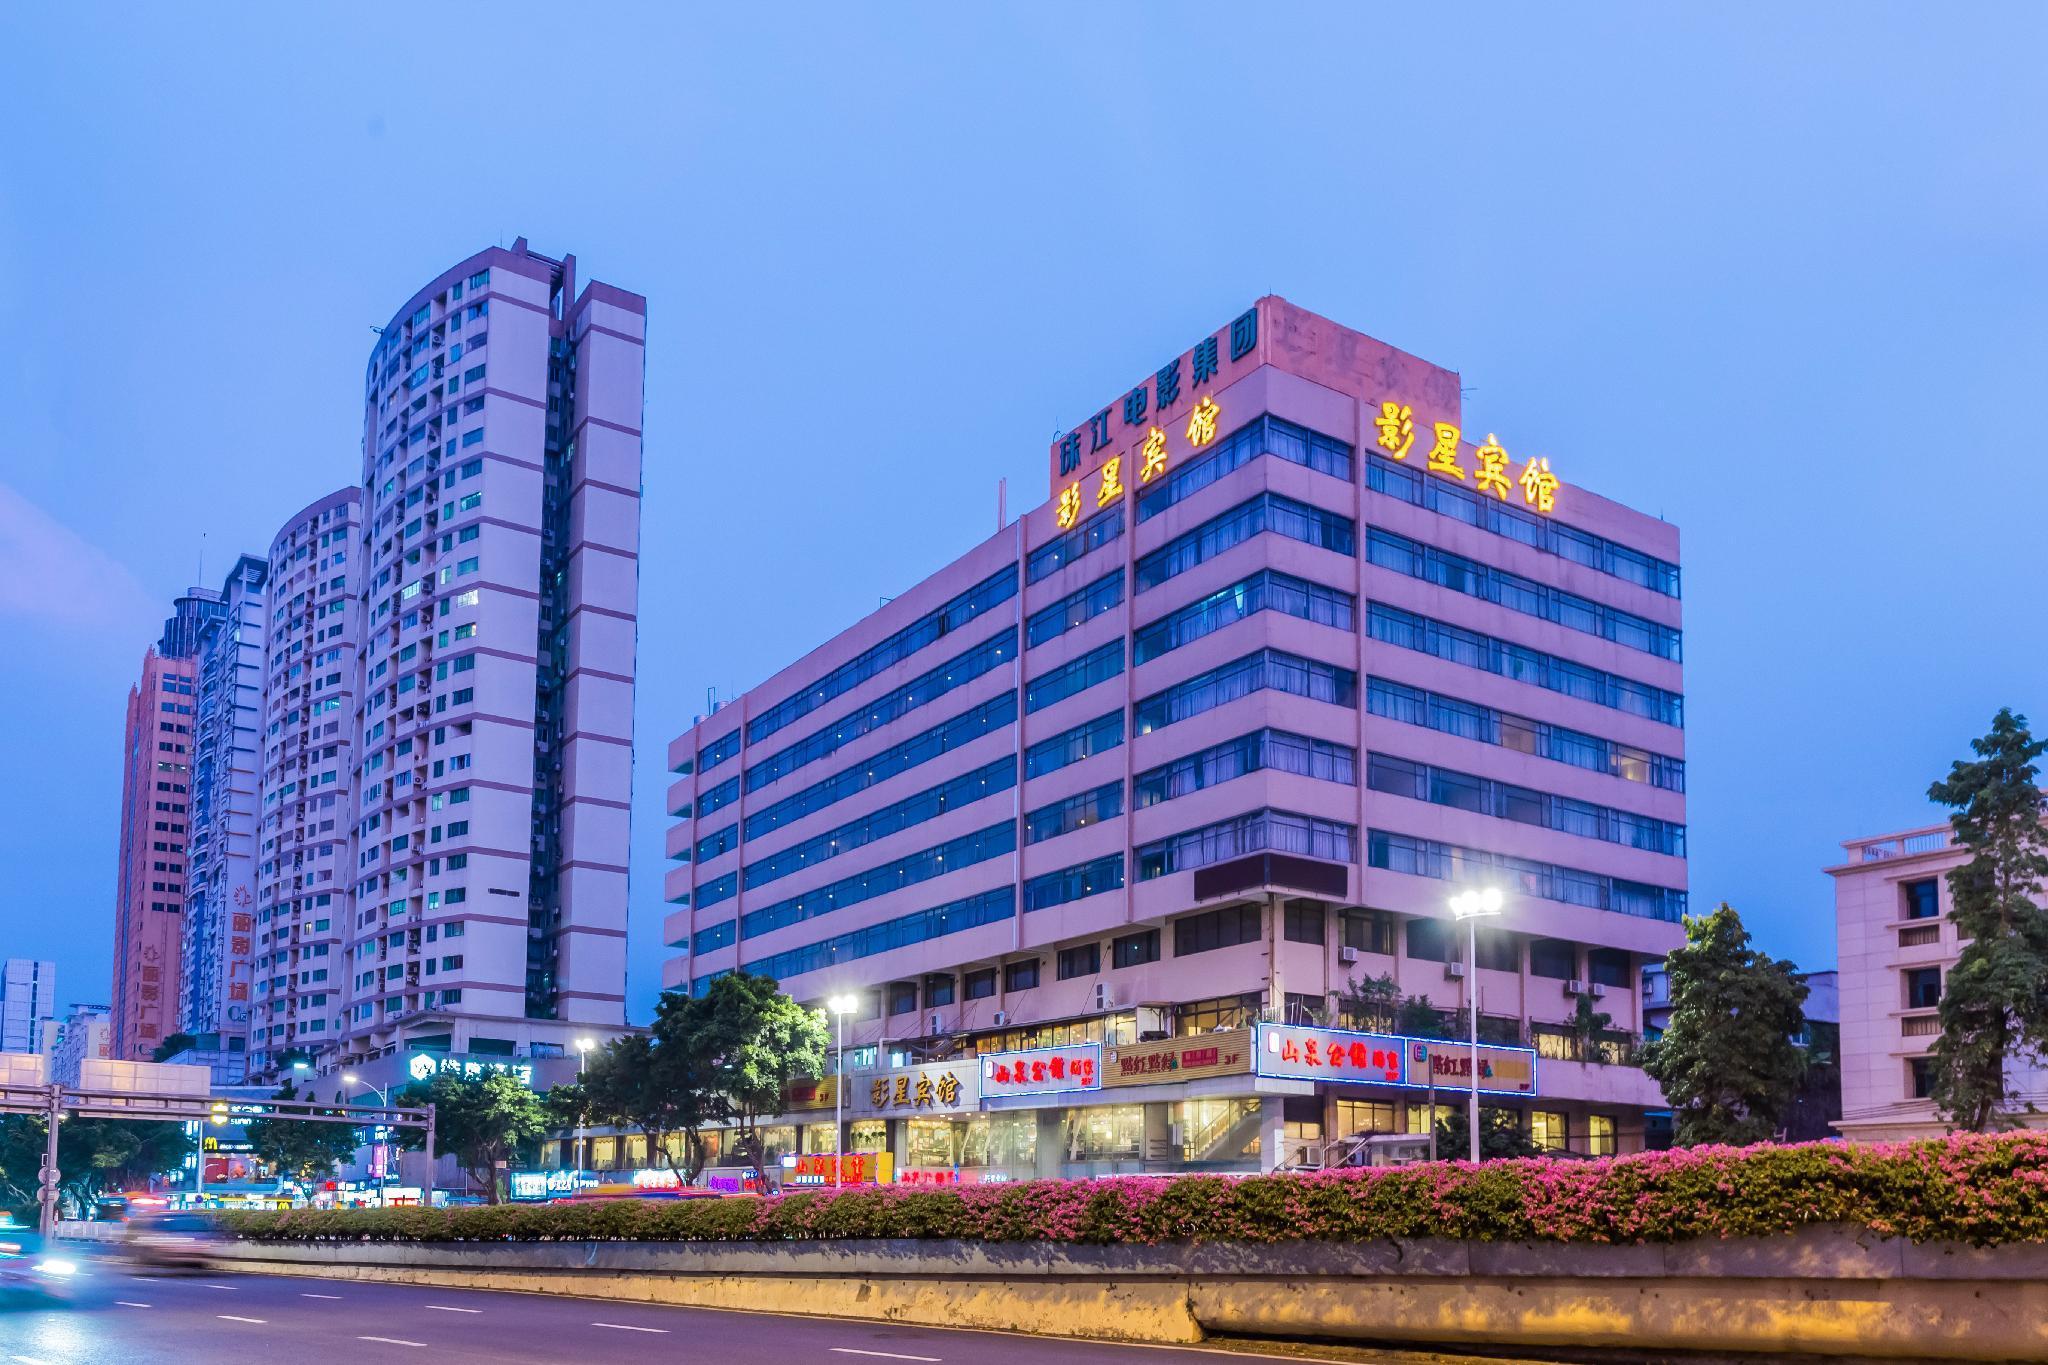 Movie Star Hotel